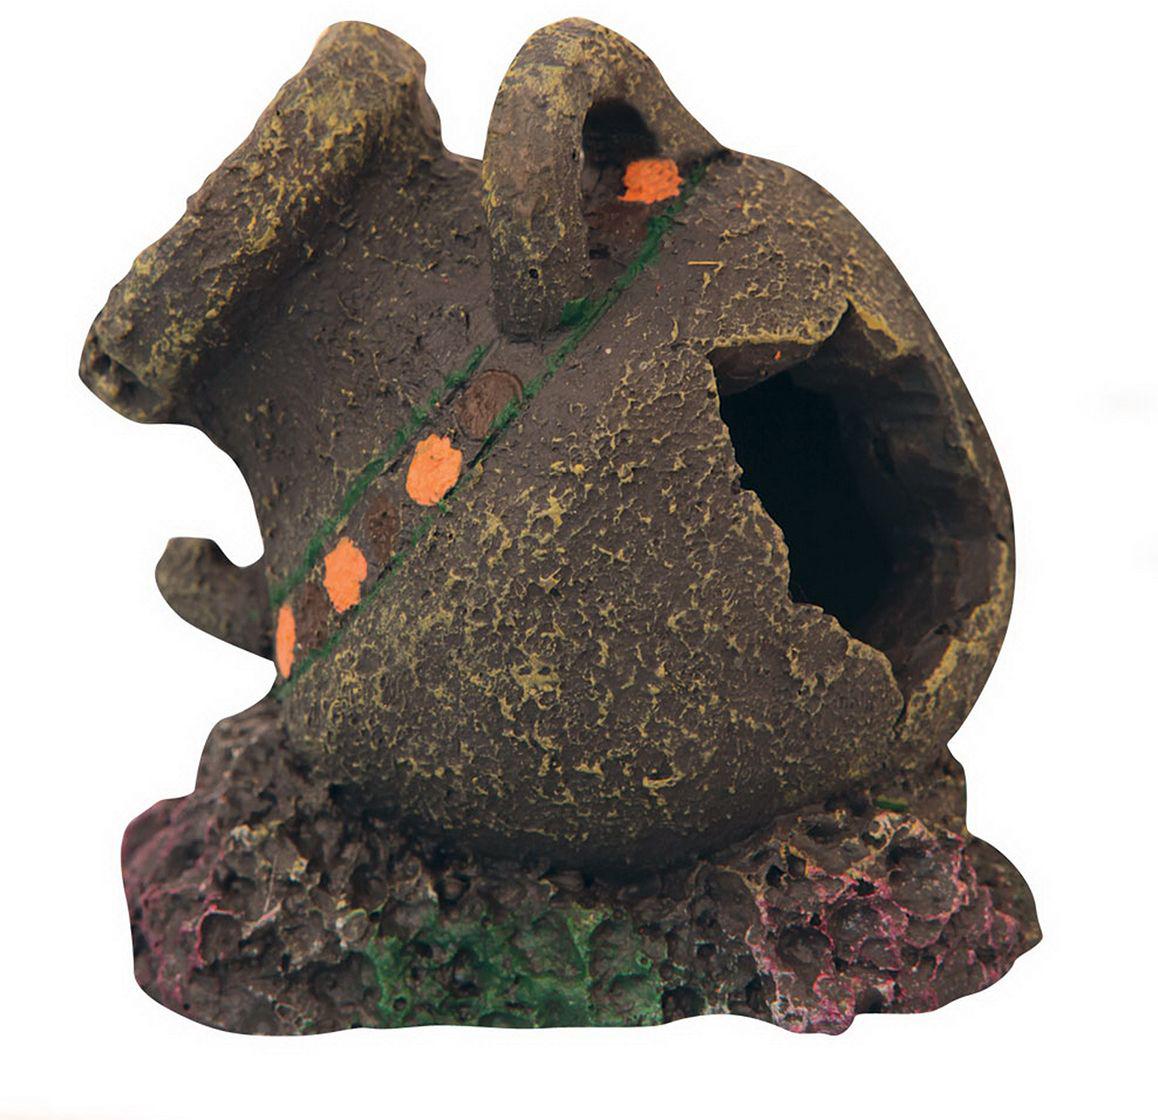 Аквадекор Dezzie Кувшин. Вдохновение, 9х8х7 см бочка для аквариума dezzie винный погреб